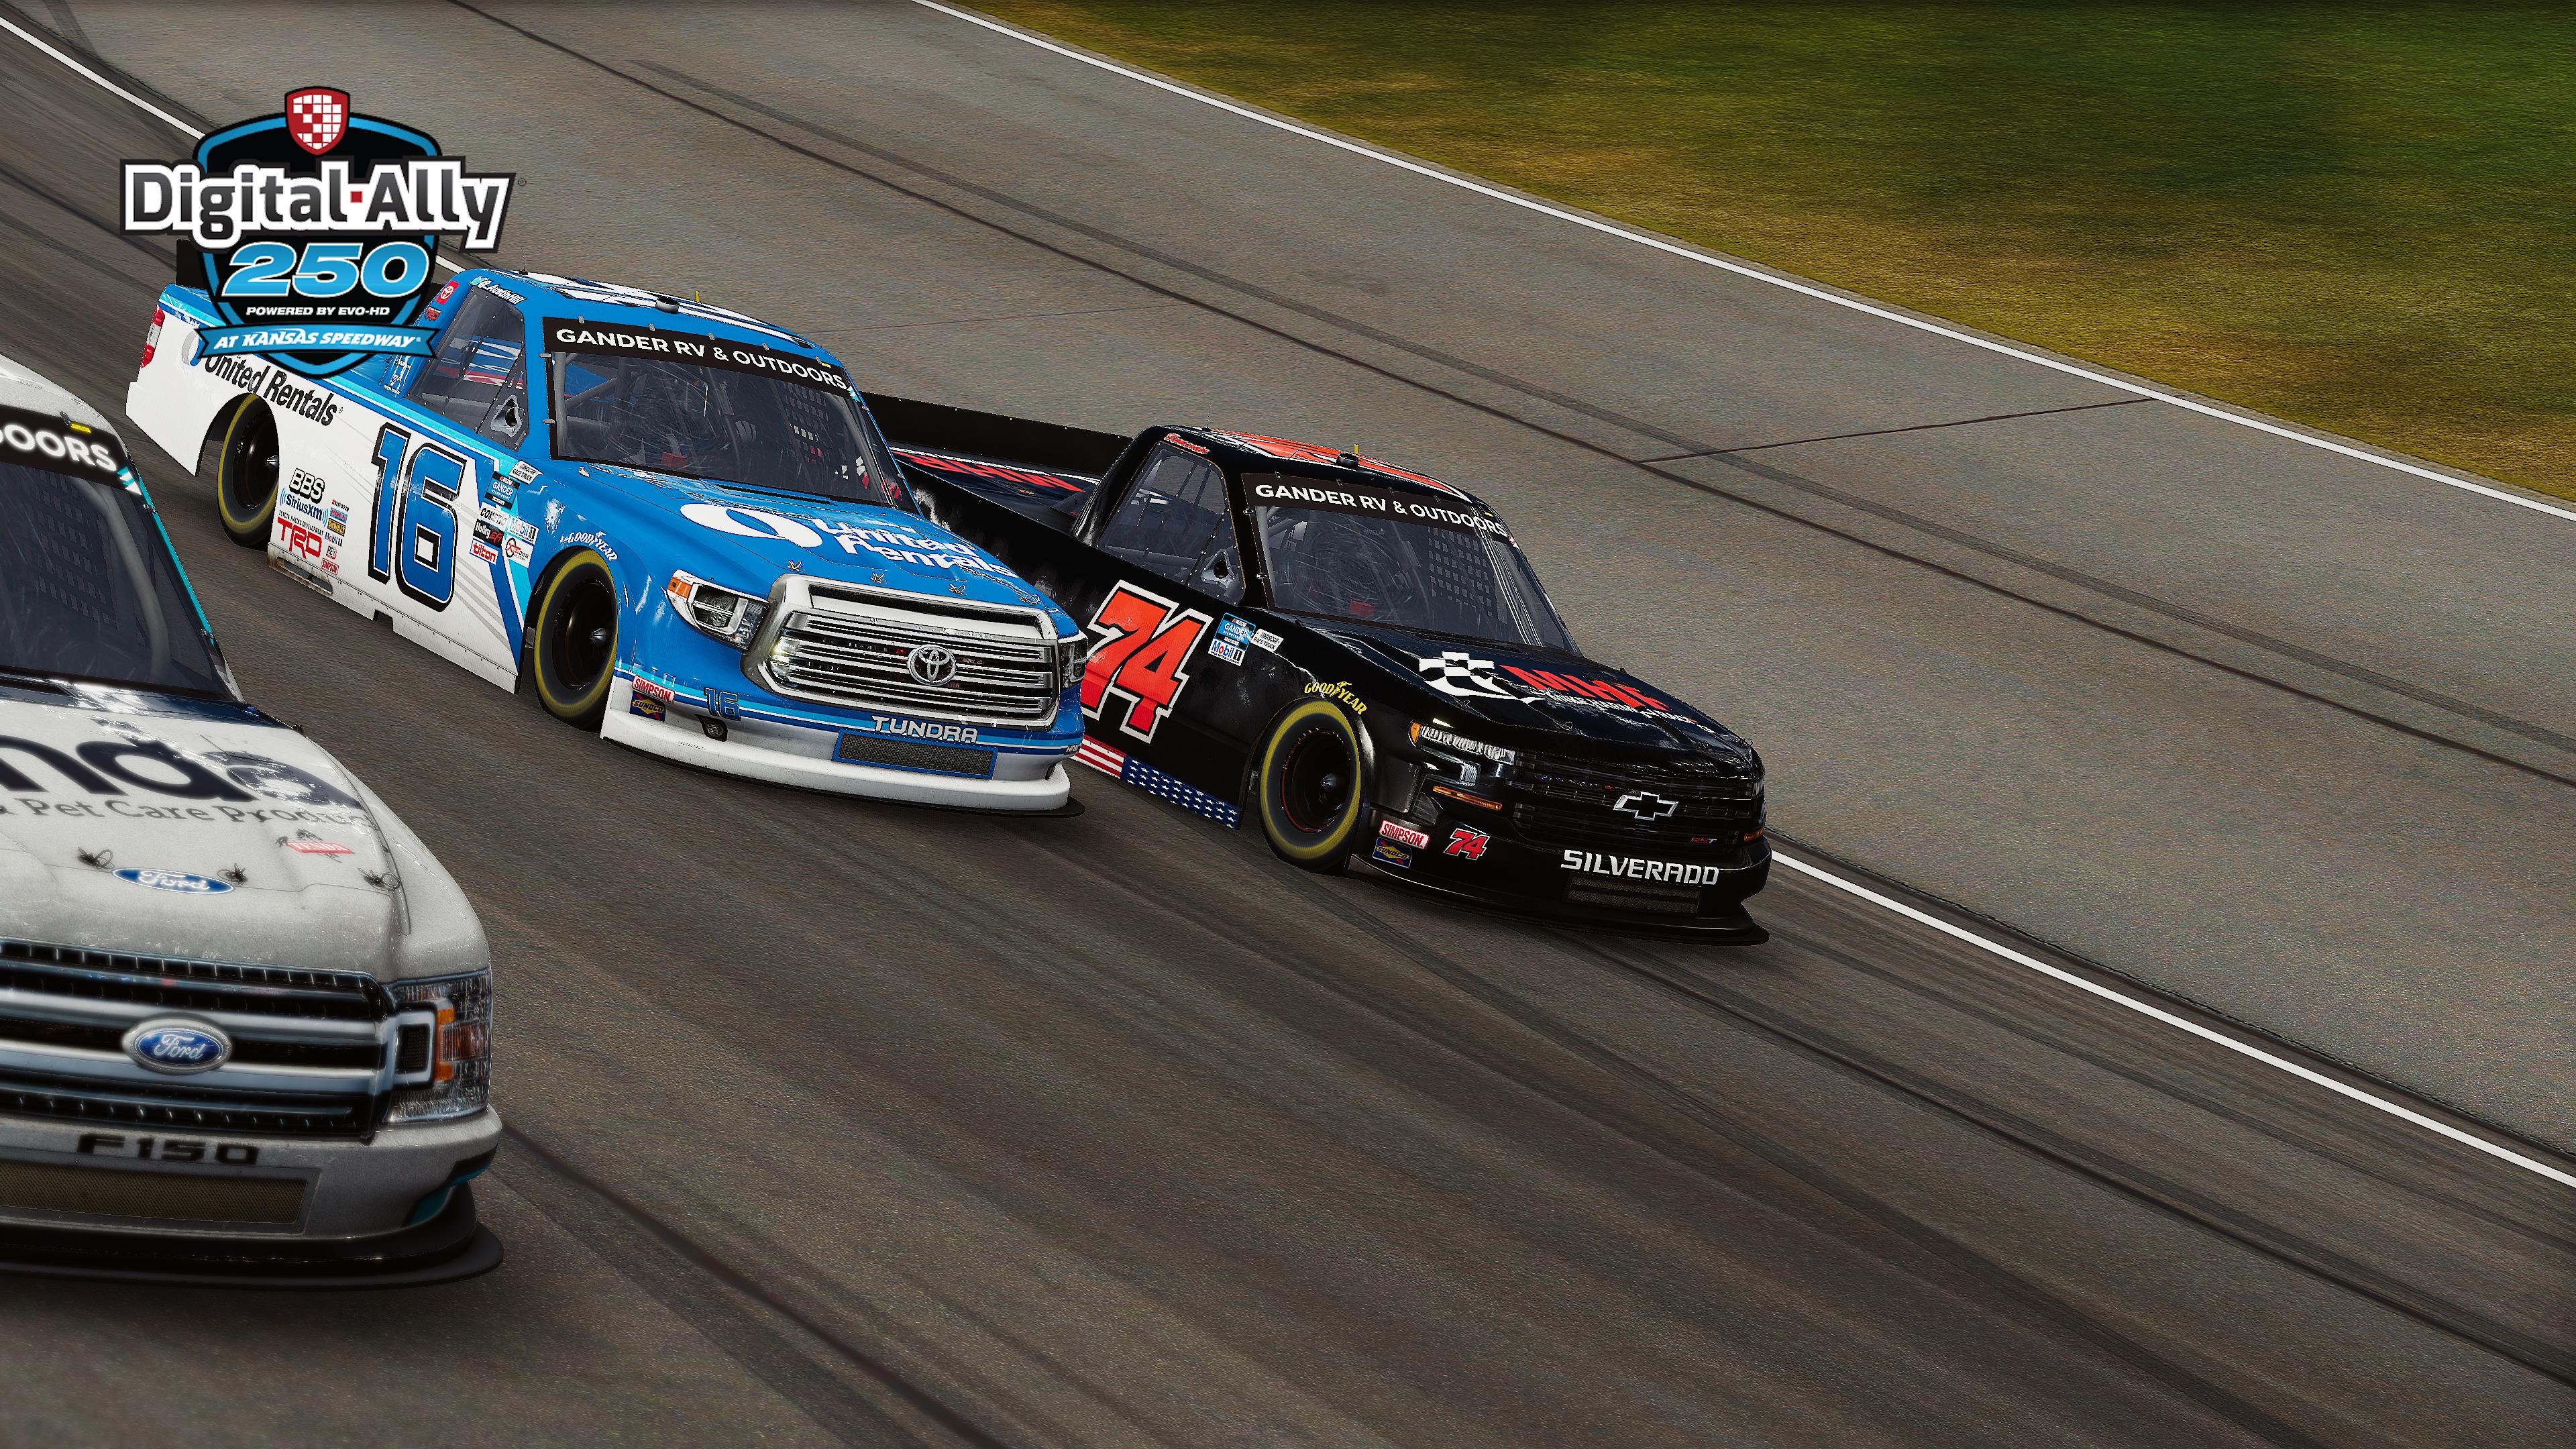 NASCAR Heat 5 6_30_2020 3_35_40 PM